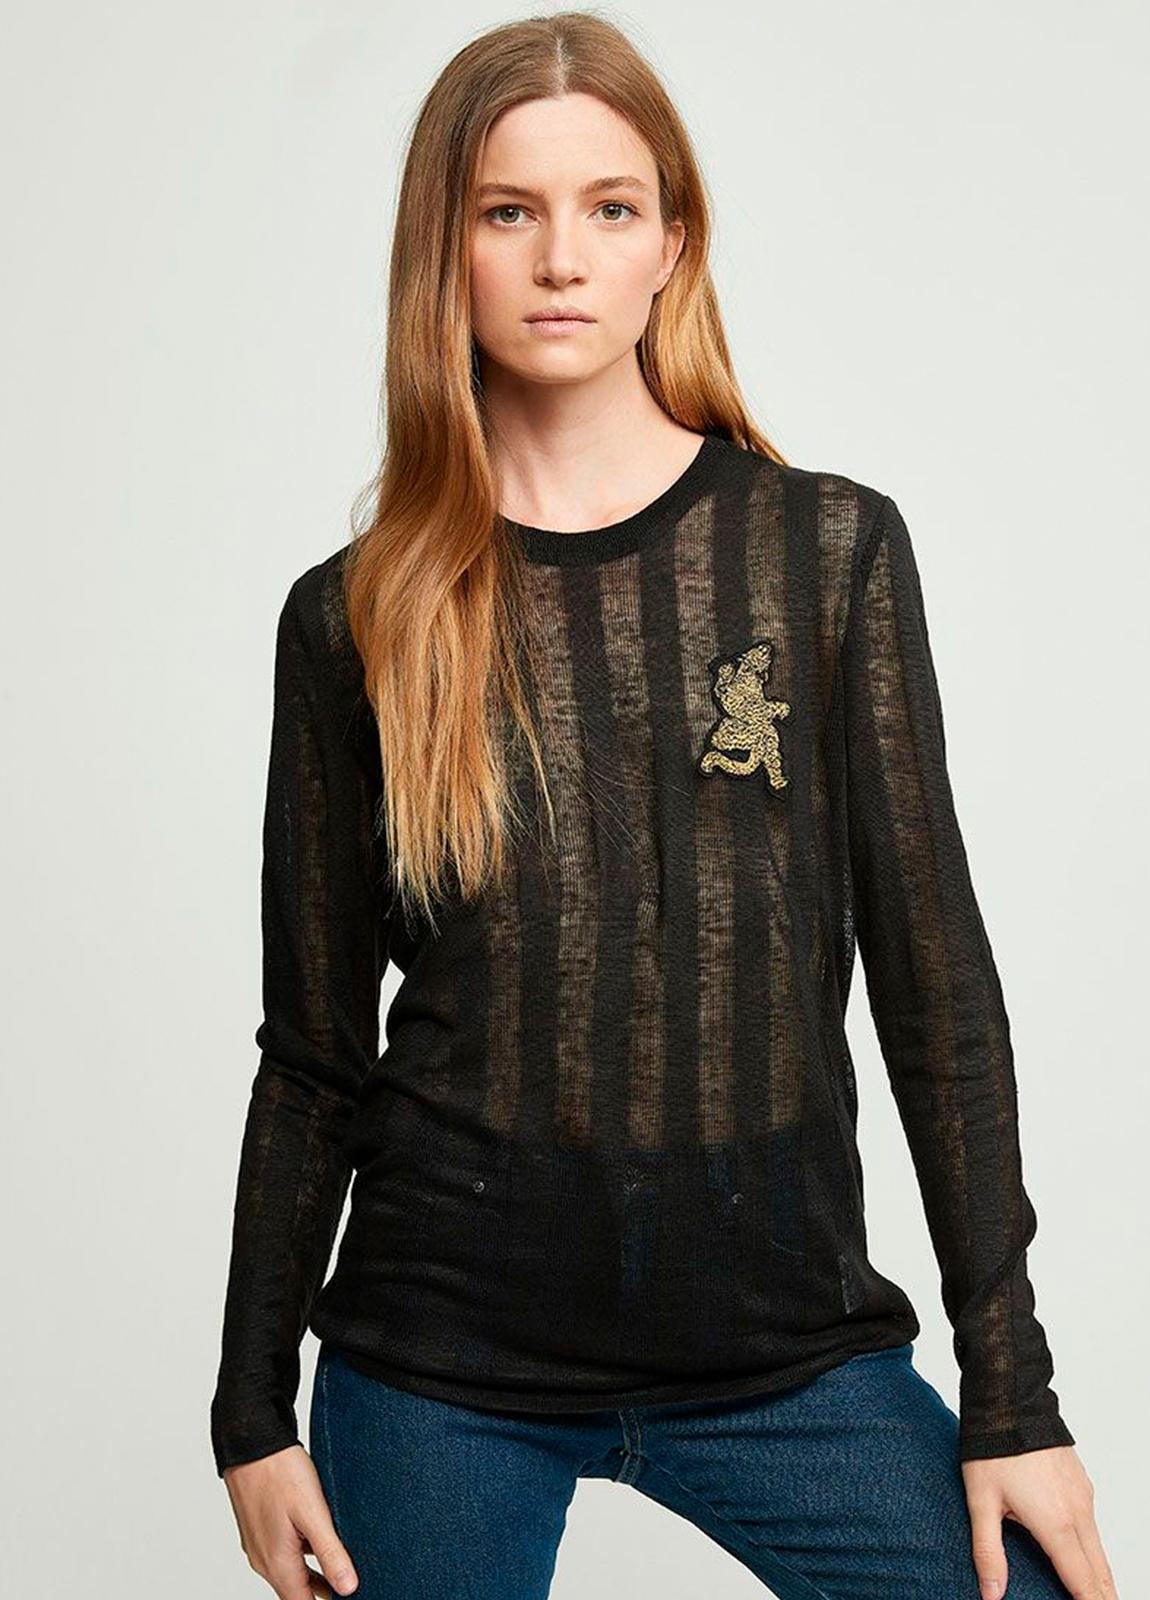 Camiseta manga larga semitransparente color negro con leopardo bordado. 100% Lino.